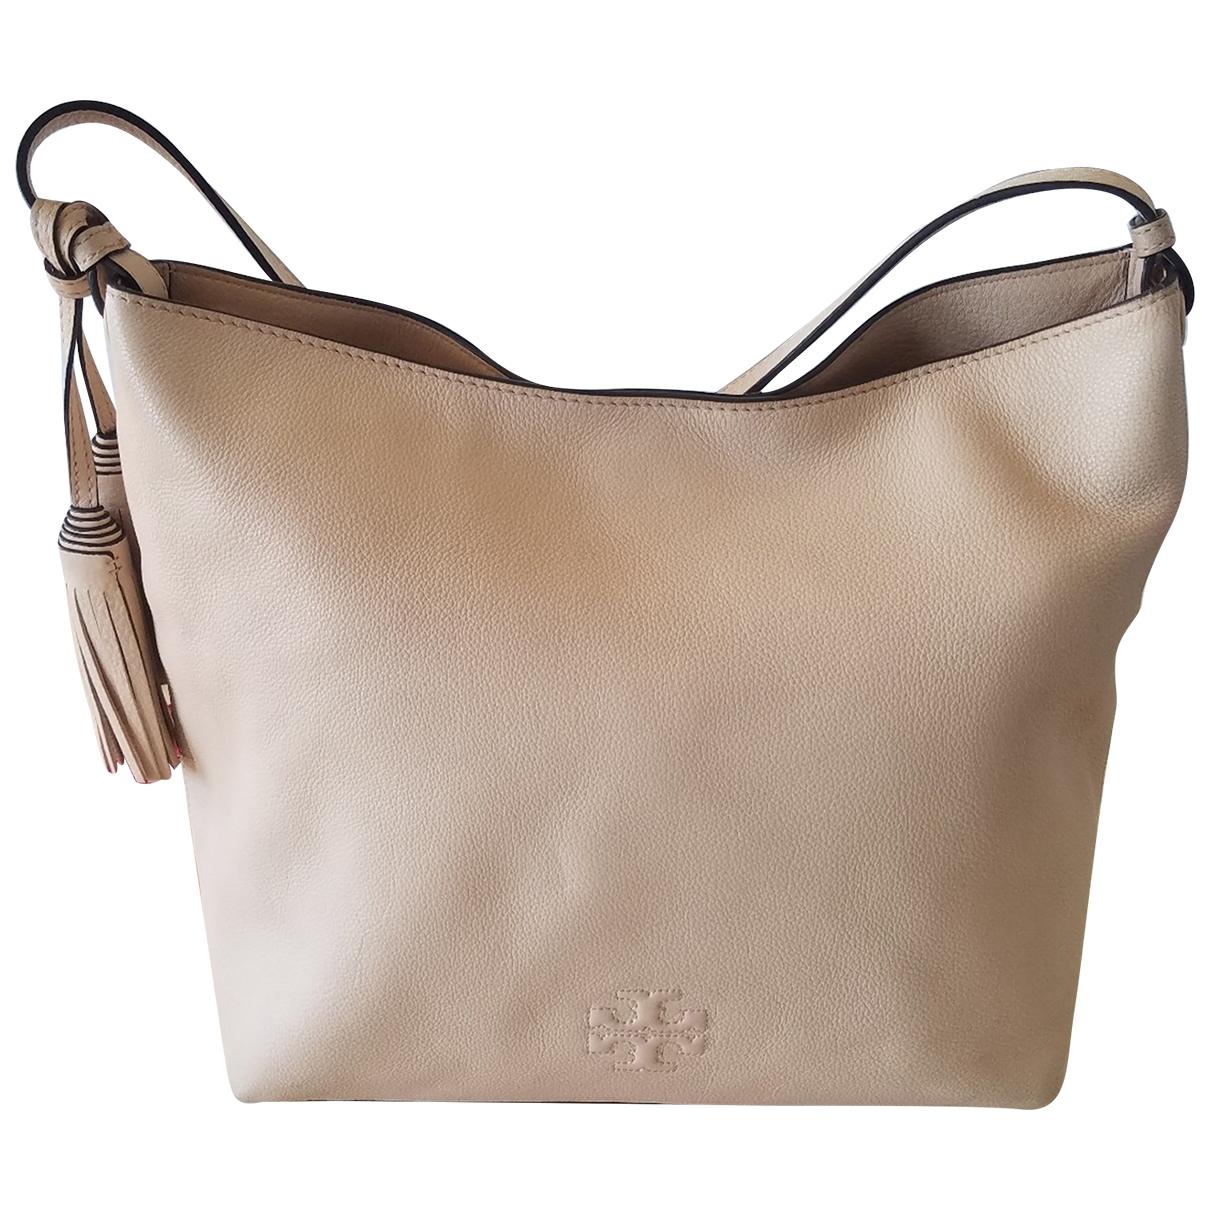 Tory Burch \N Pink Leather handbag for Women \N